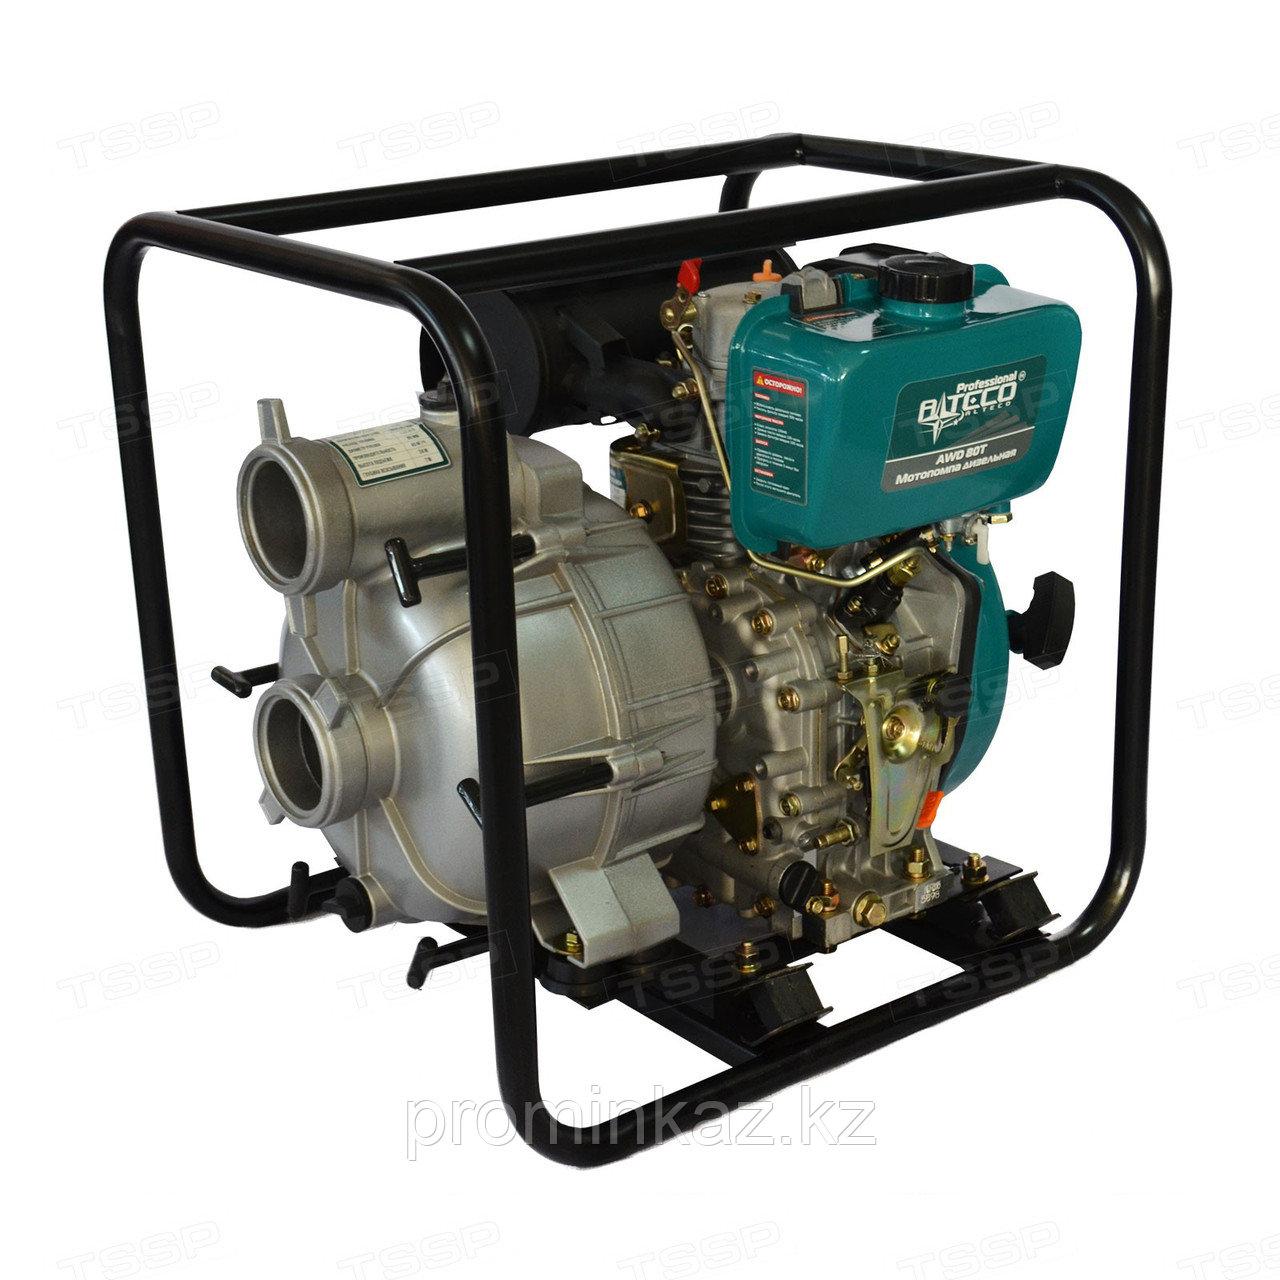 Мотопомпа дизельная ALTECO AWD100T, для грязной воды